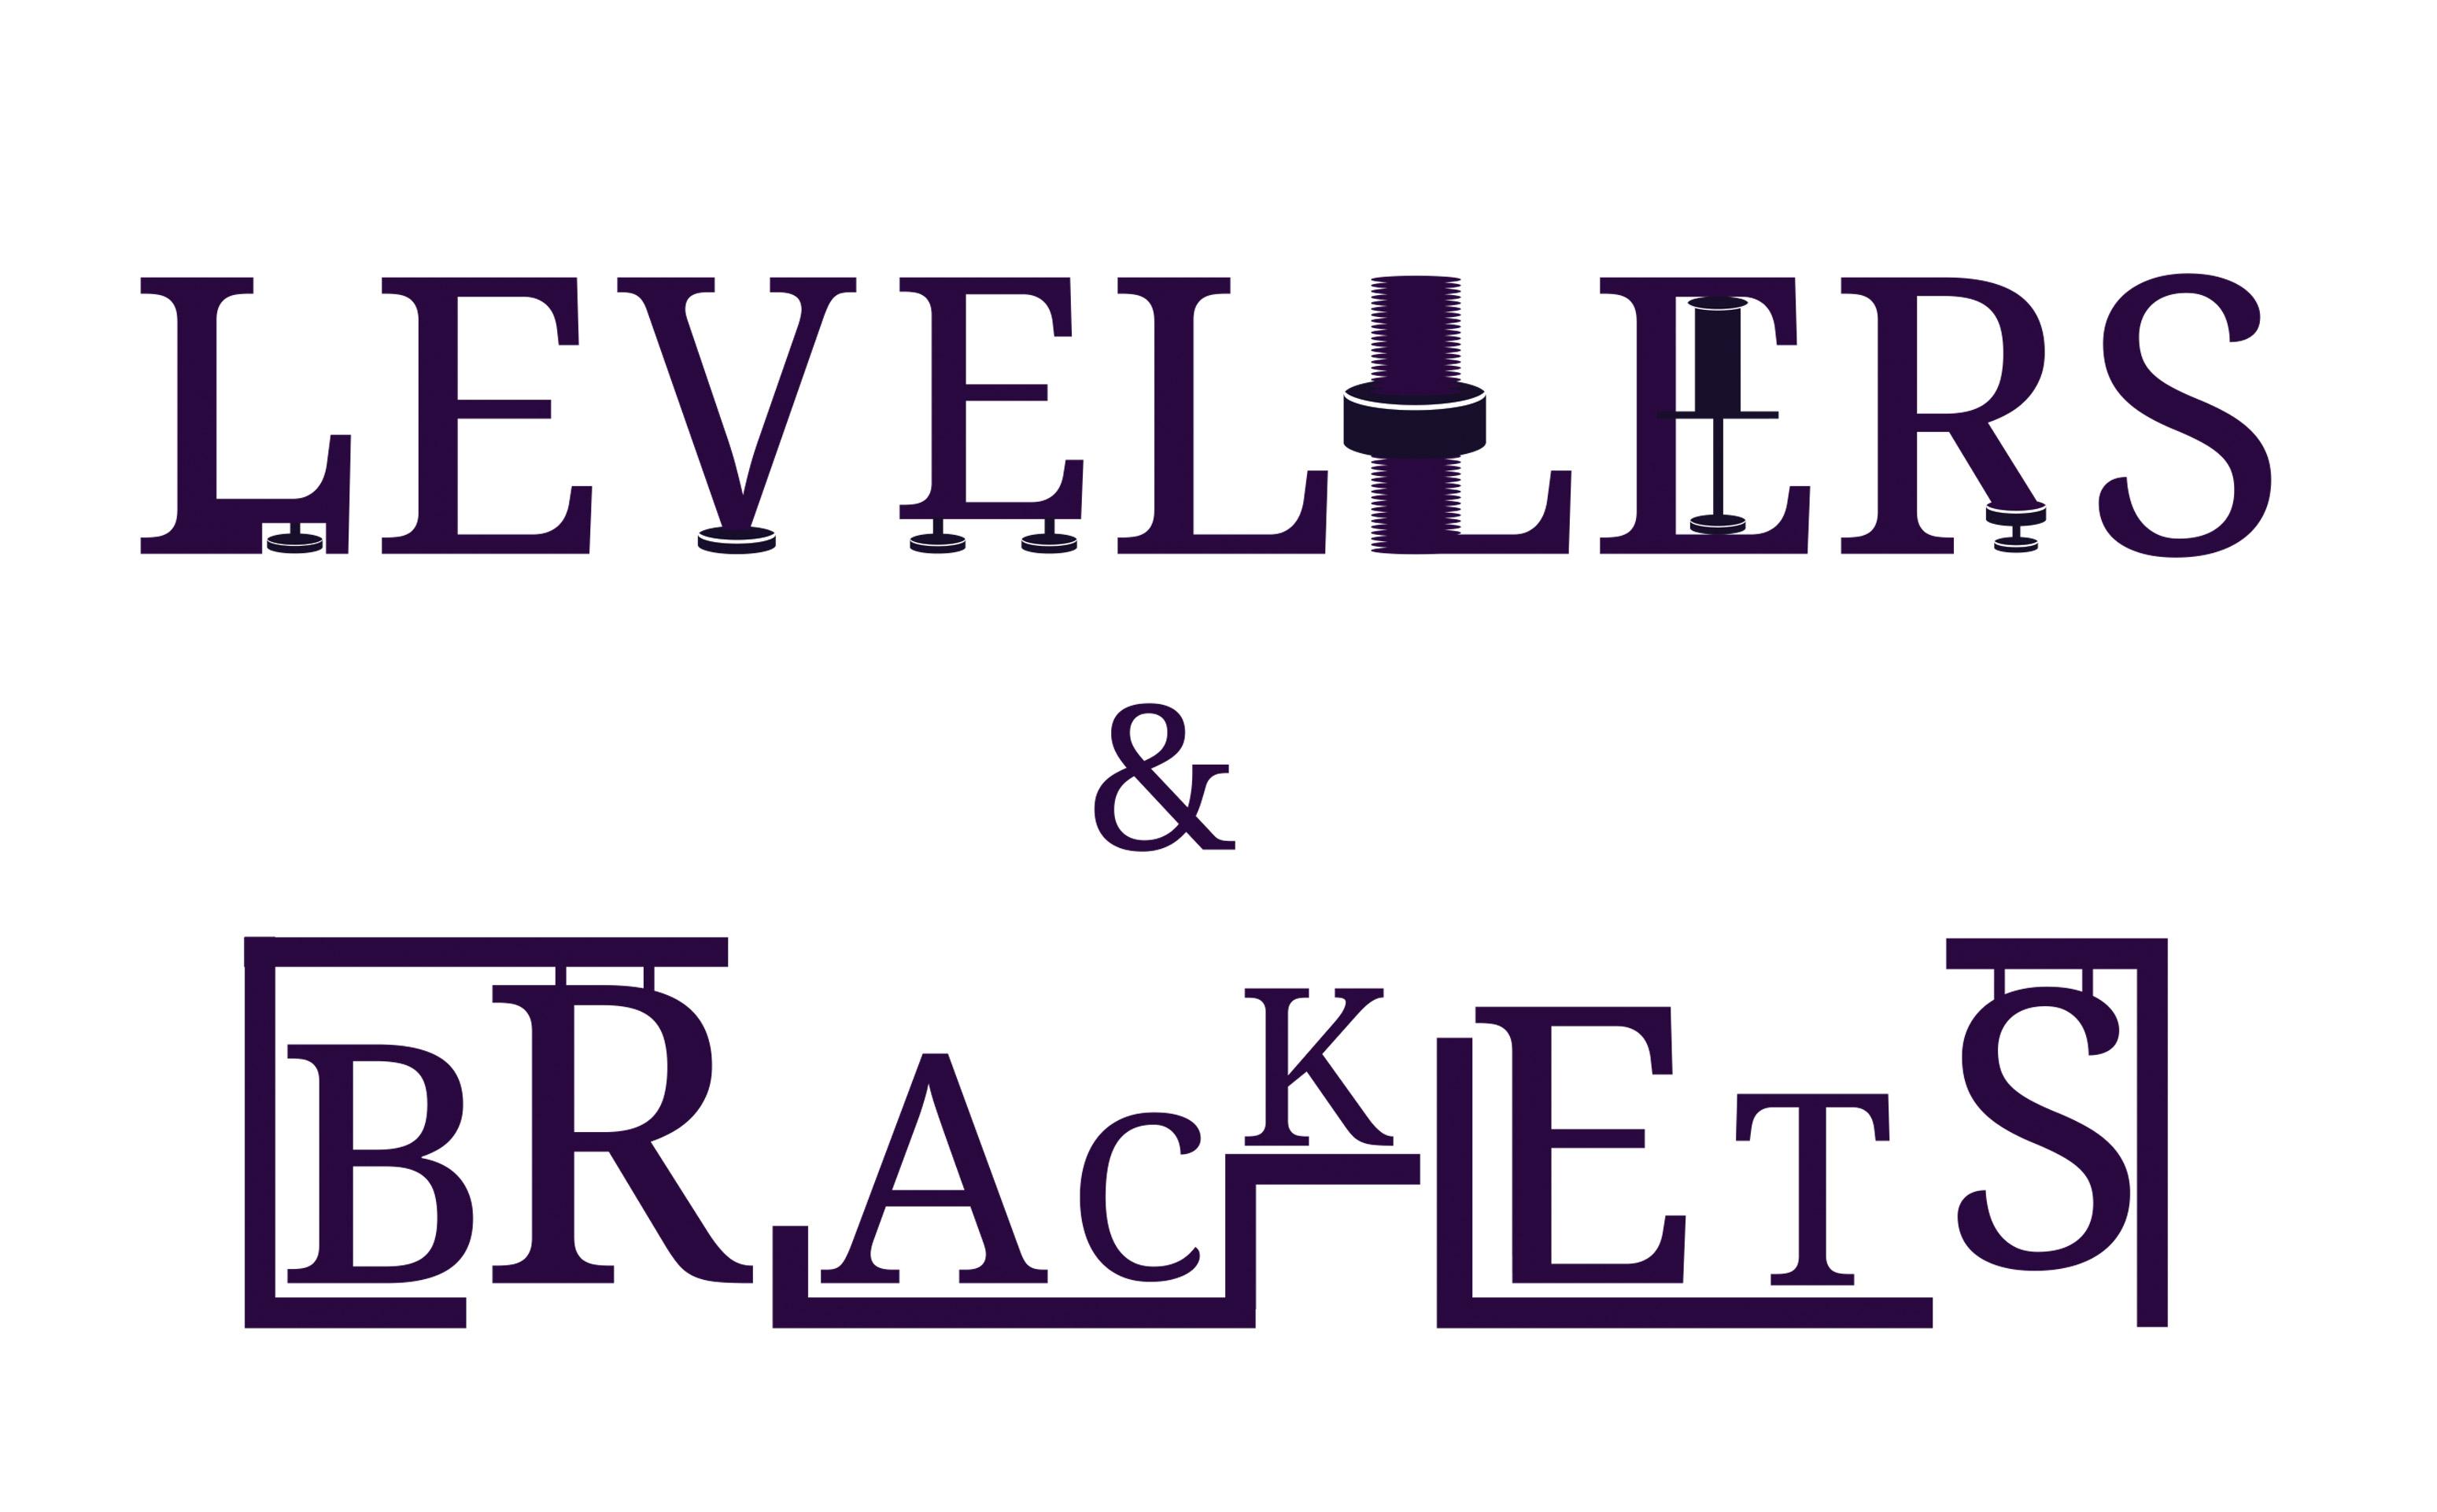 Levellers & Brackets